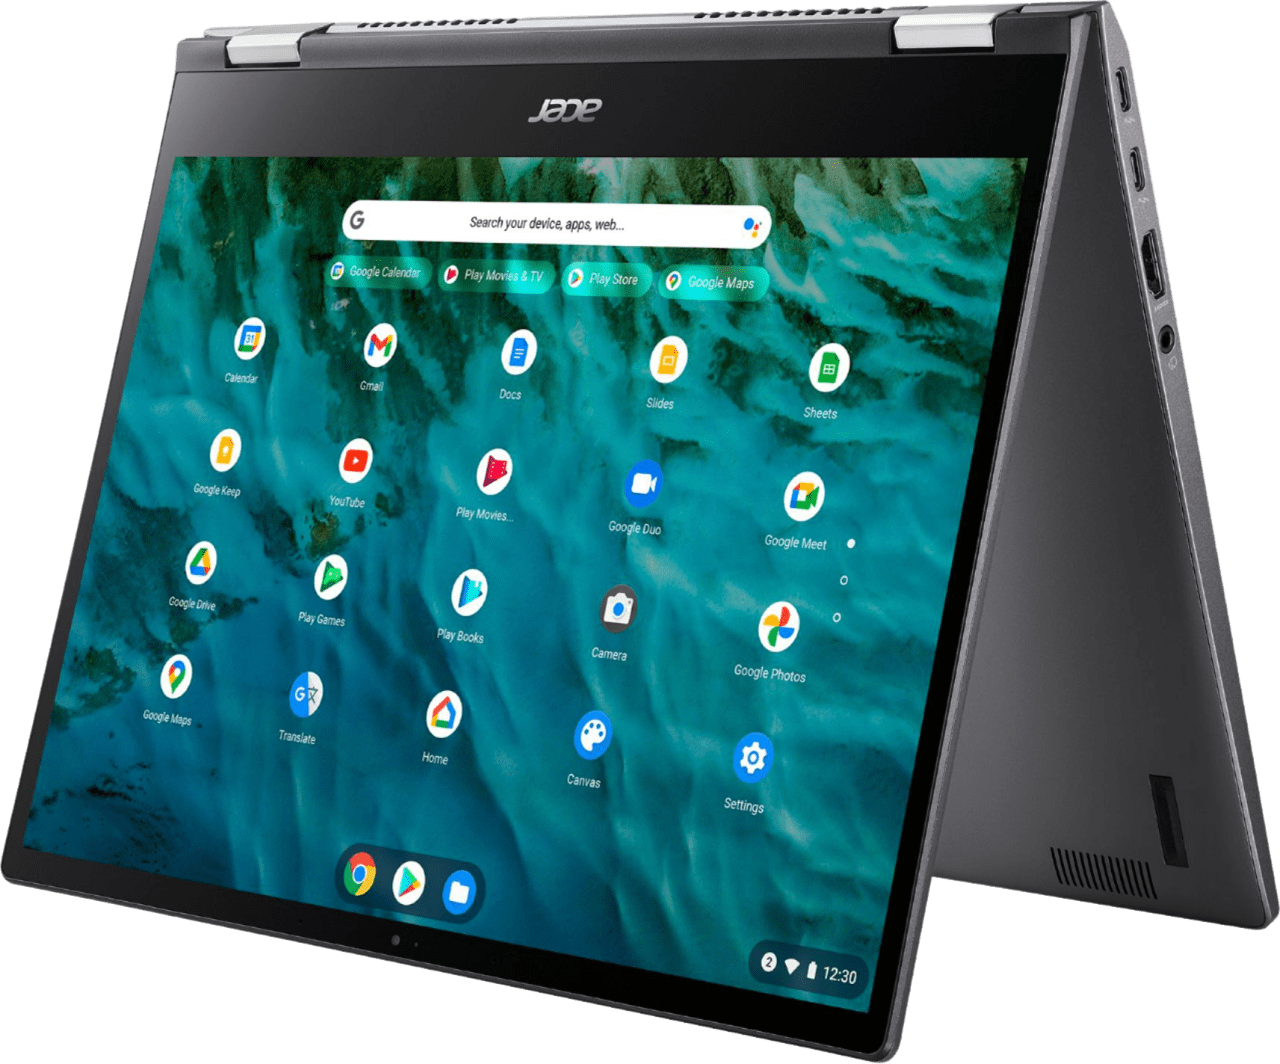 Black Acer Chromebook Spin 713 Laptop - Intel Evo Core i5 – 8GB – 256GB SSD.1